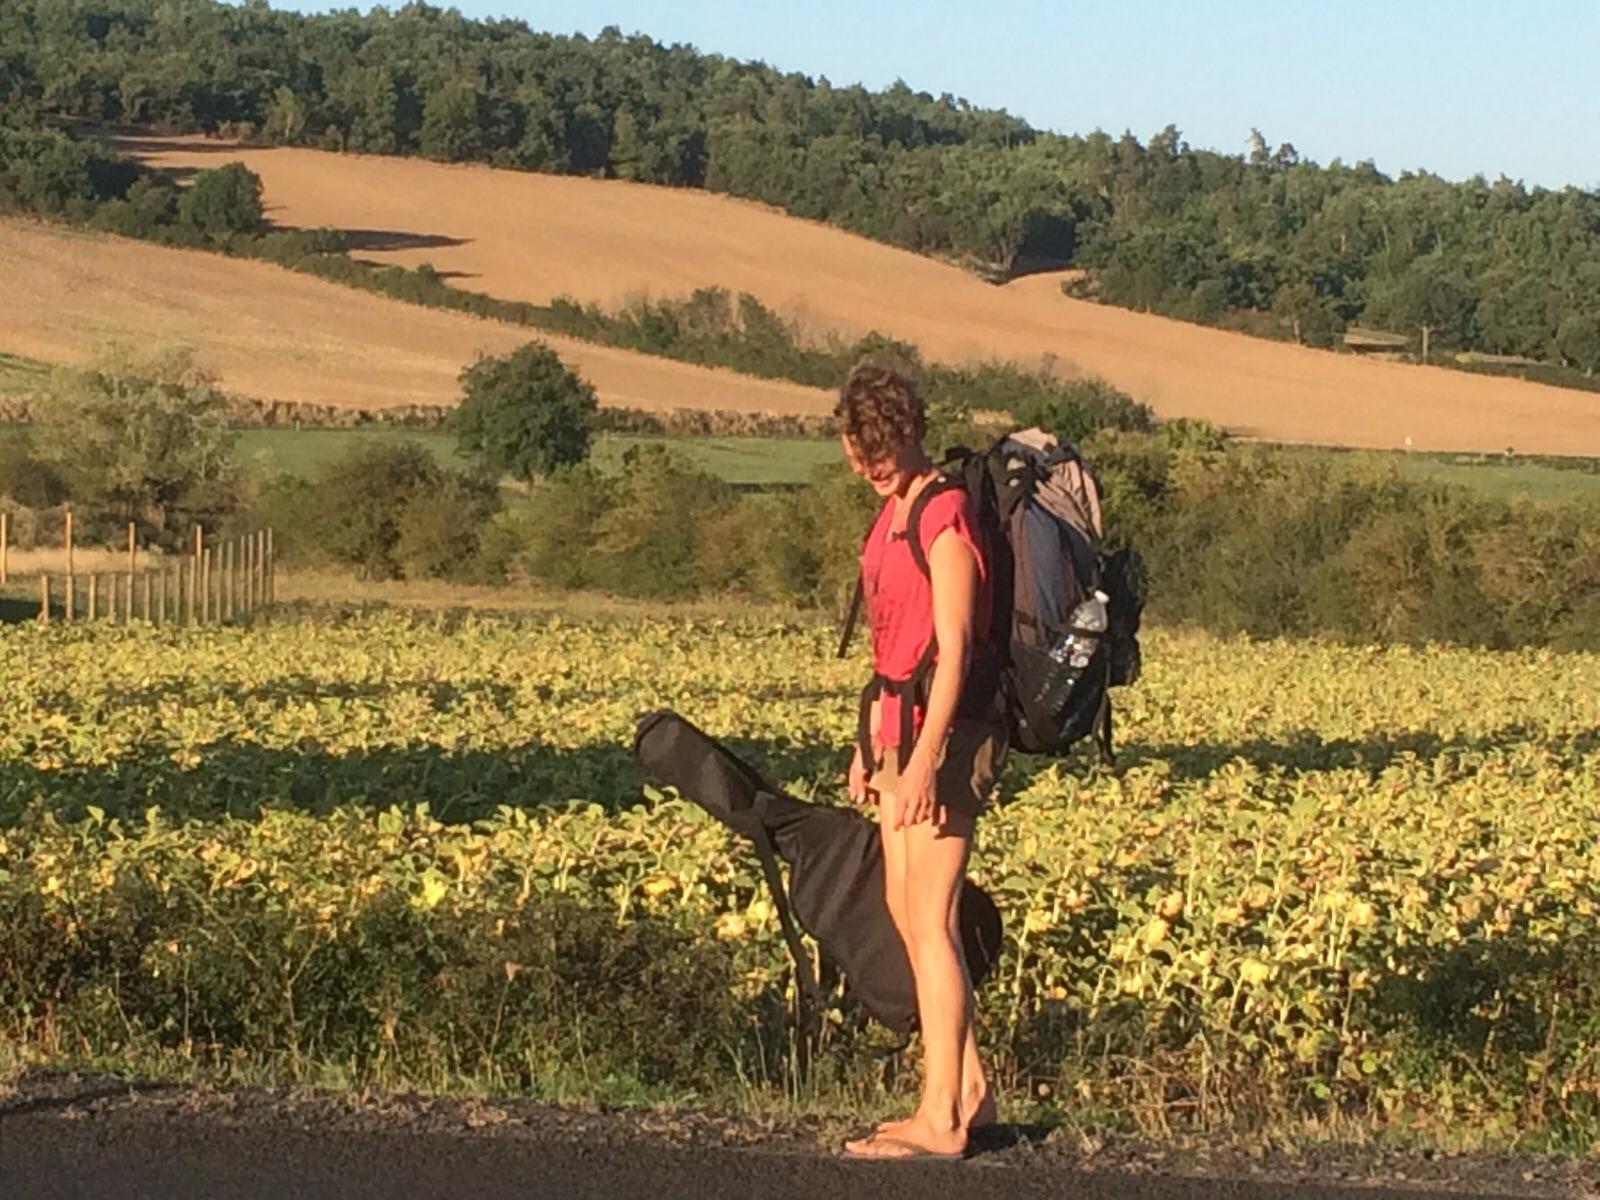 Illustrated travelblog travel illustration Hitchhiking through France